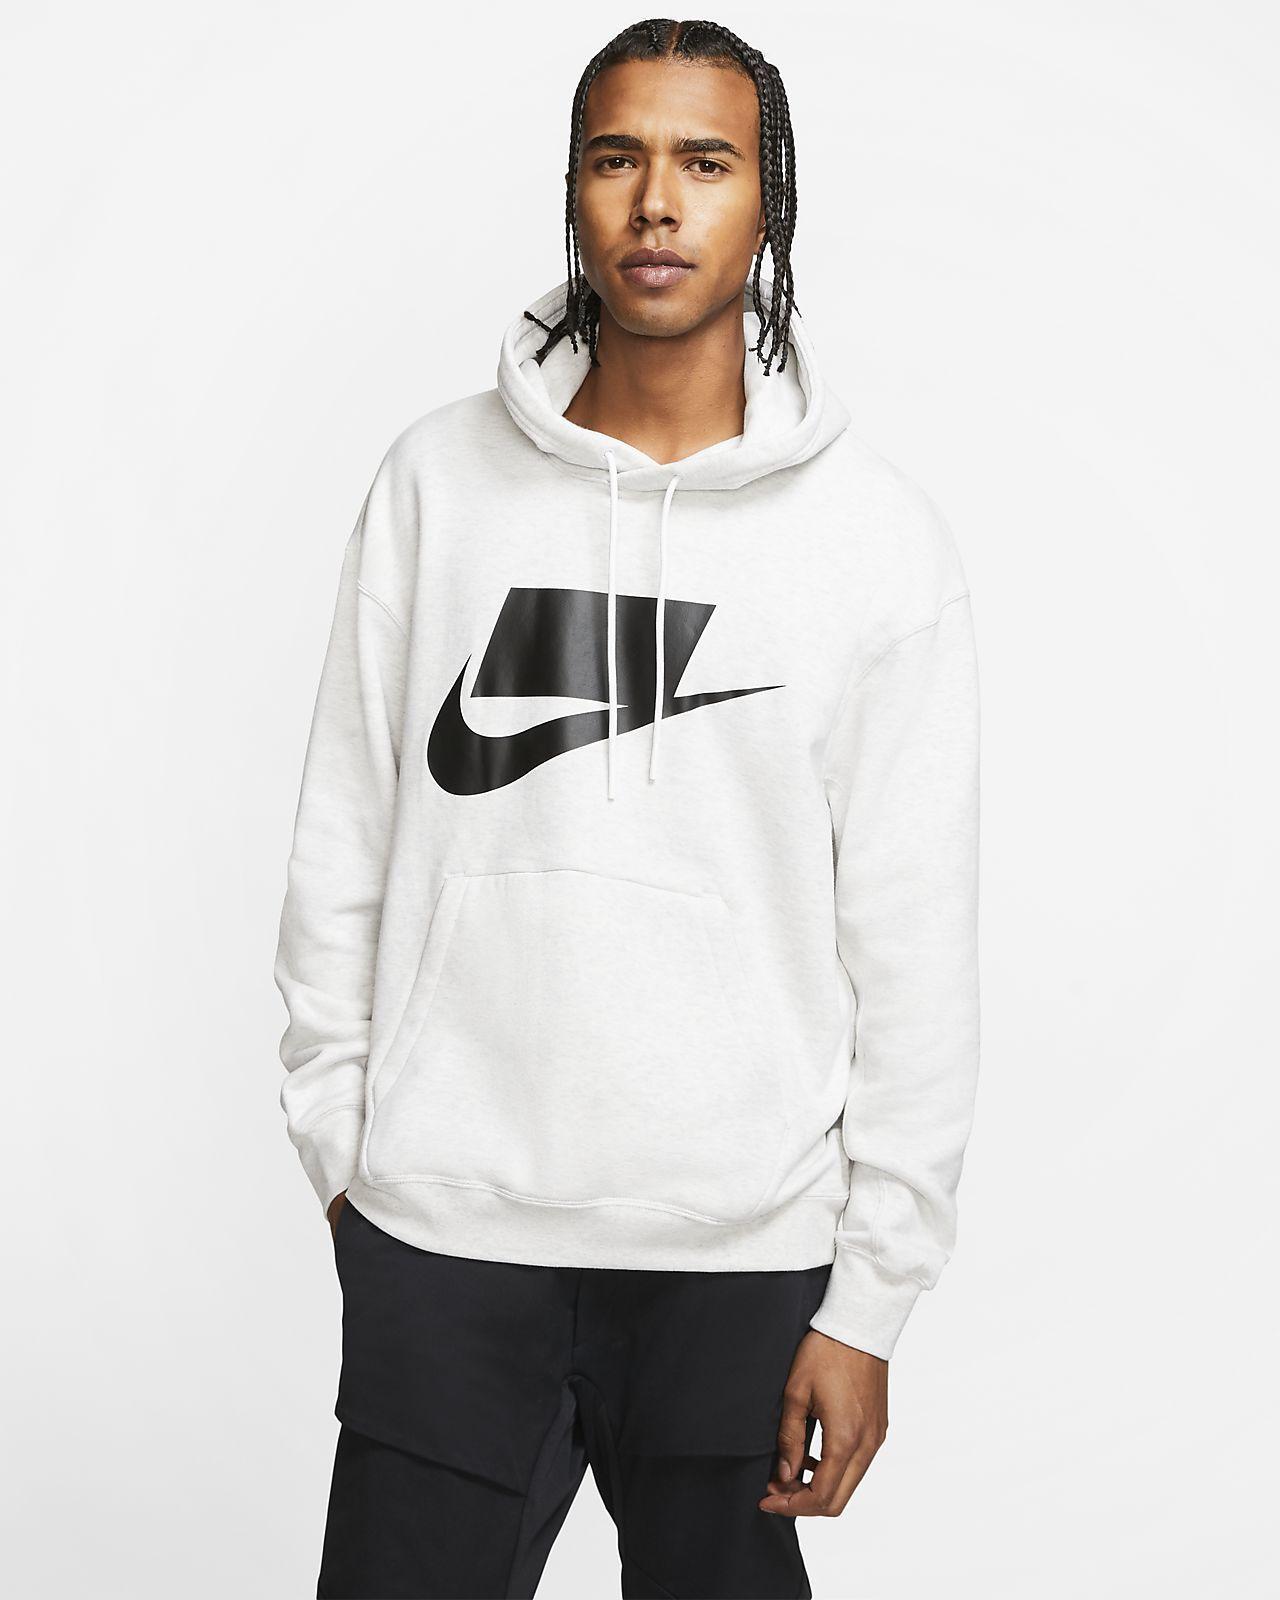 Nike Sportswear Nsw French Terry Pullover Hoodie Nike Com French Terry Pullover Nike Sportswear White Hoodie Men [ 1600 x 1280 Pixel ]